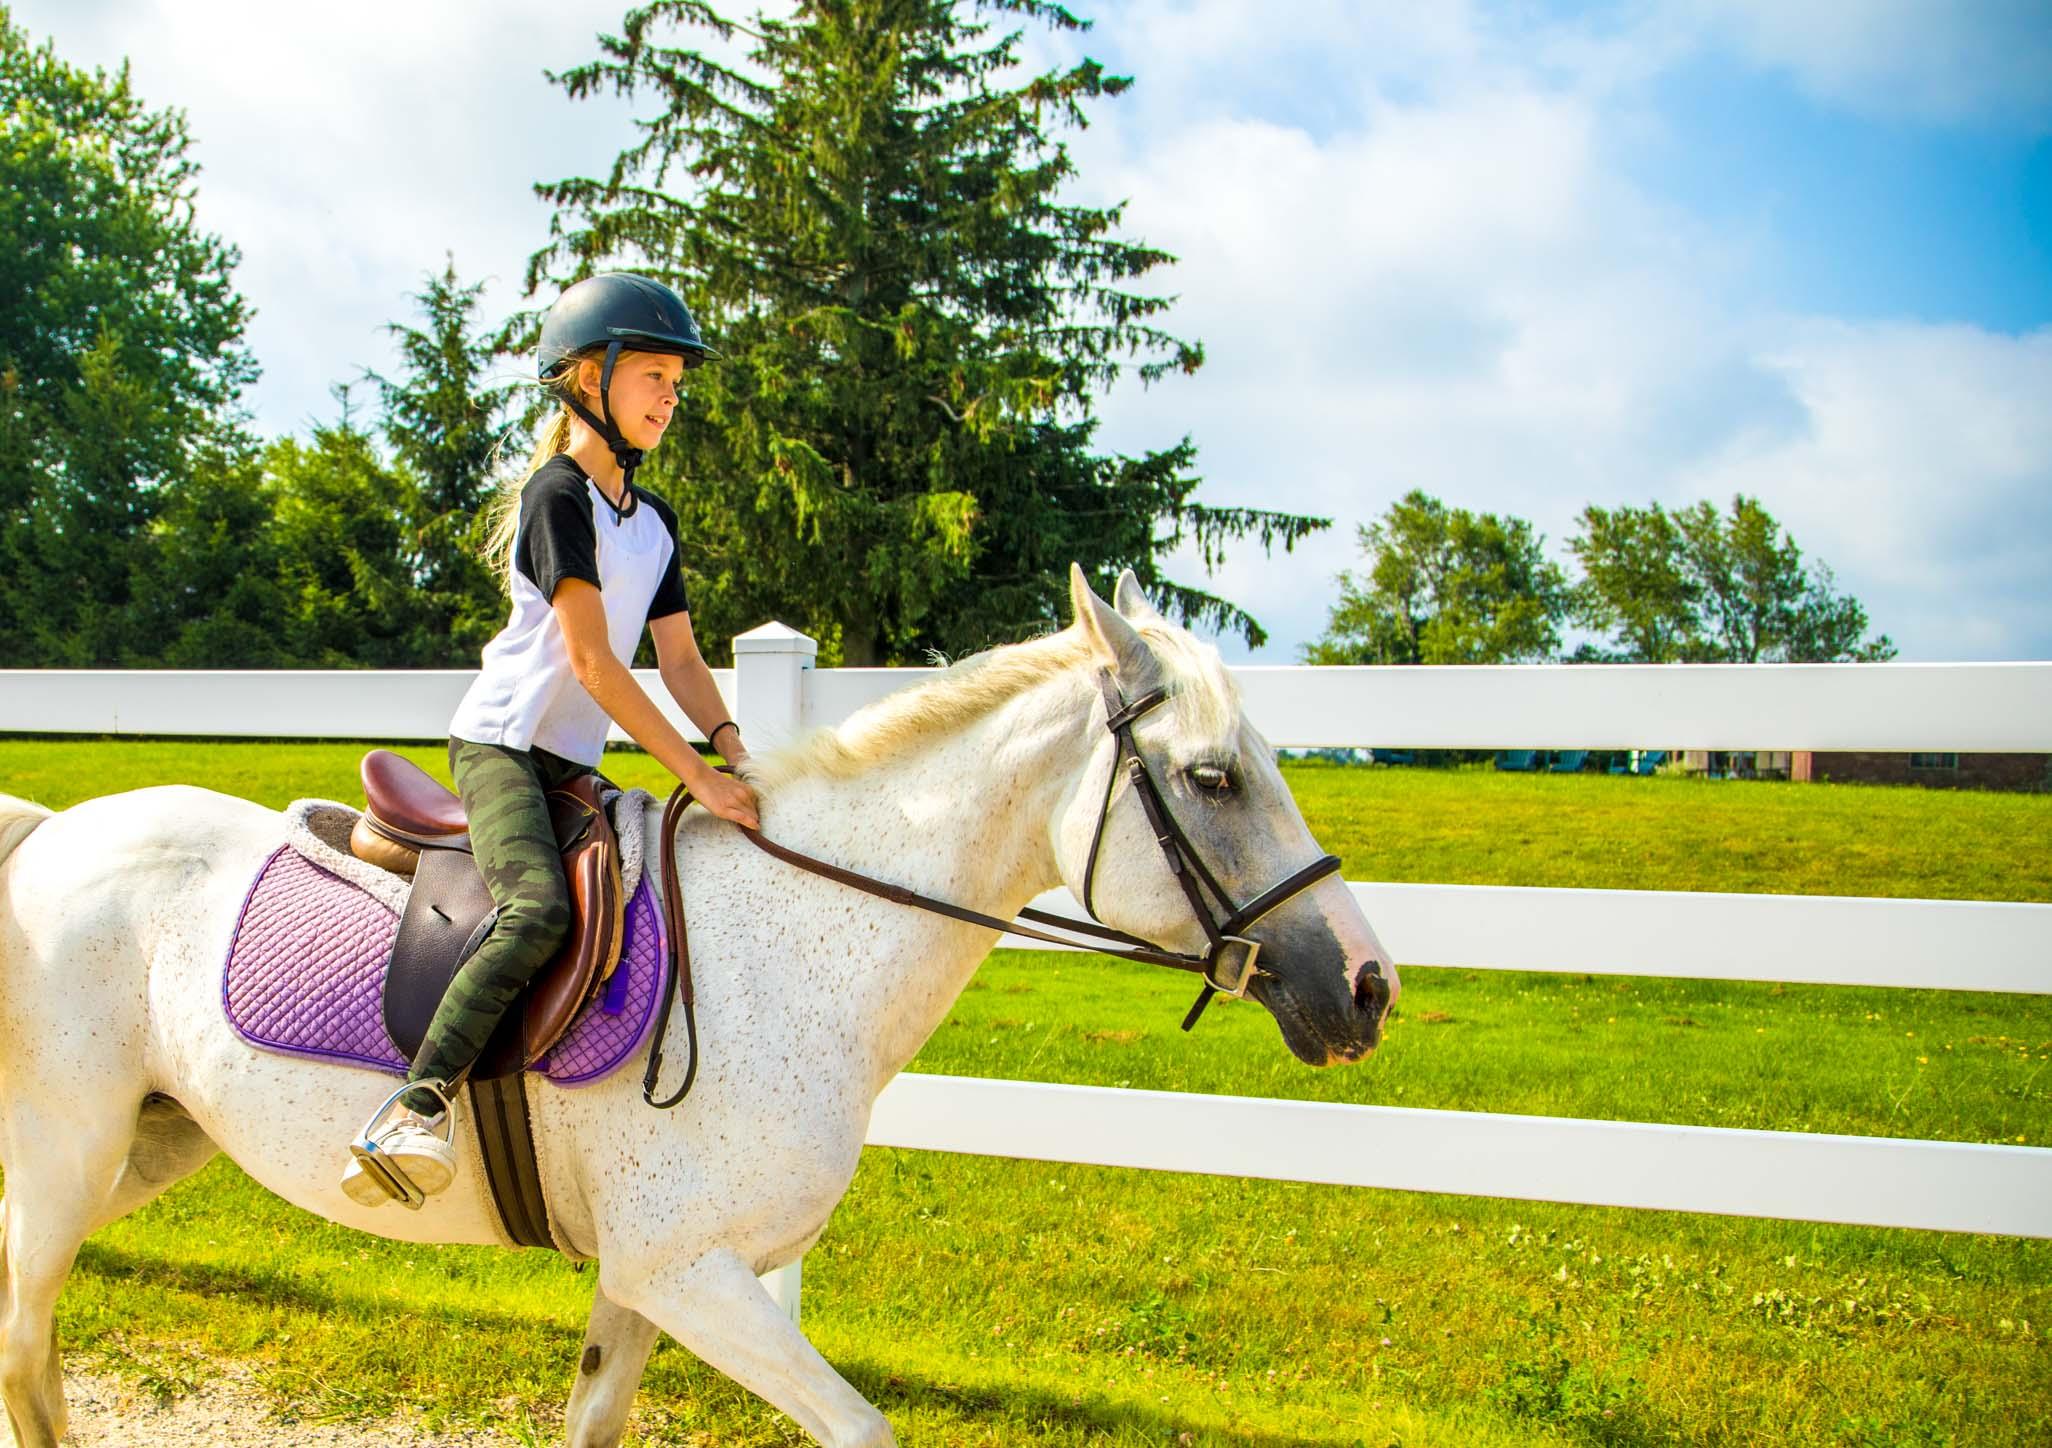 camper-riding-horse